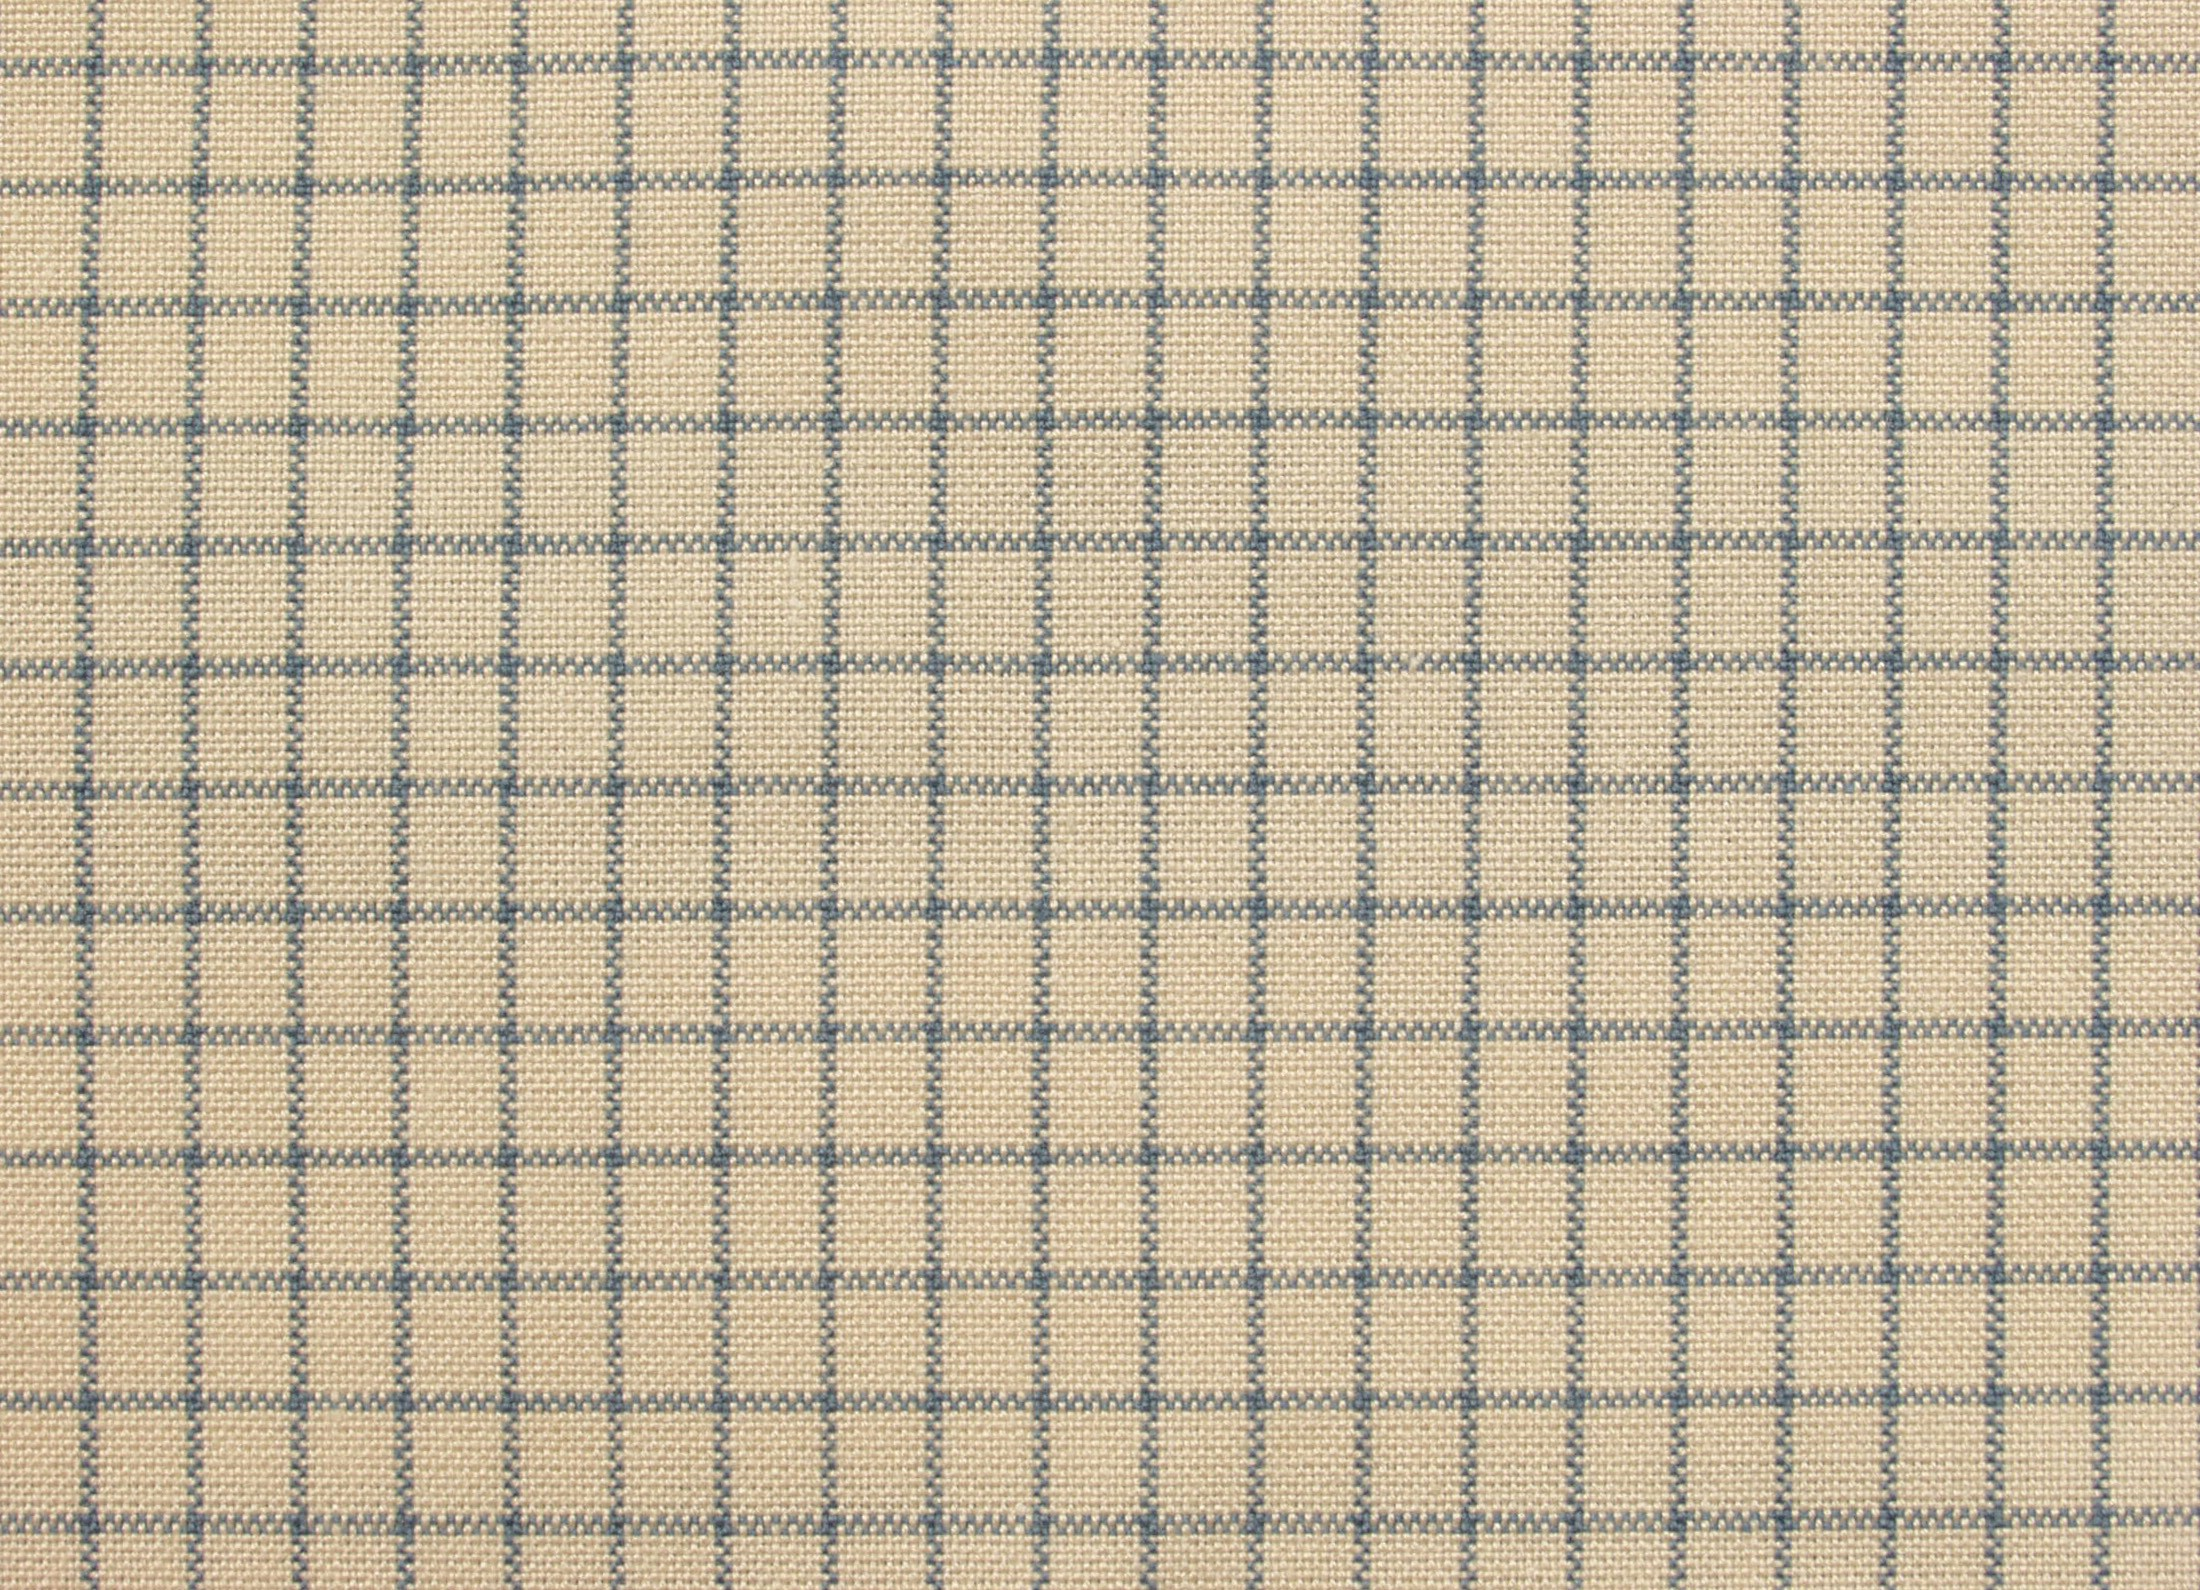 Текстура ткани | Текстура ткани с ...: junior3d.ru/texture/tkanRisunok.html